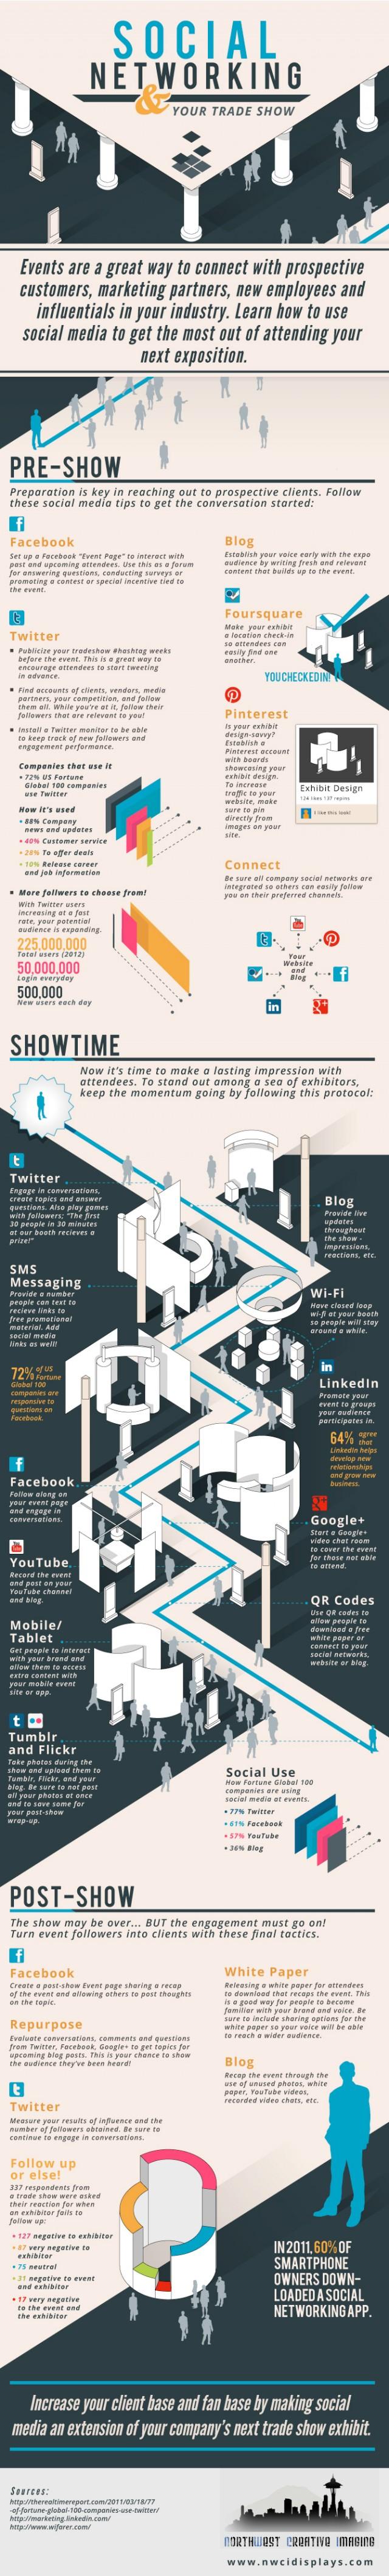 Social Media Tradeshow Marketing #infographic